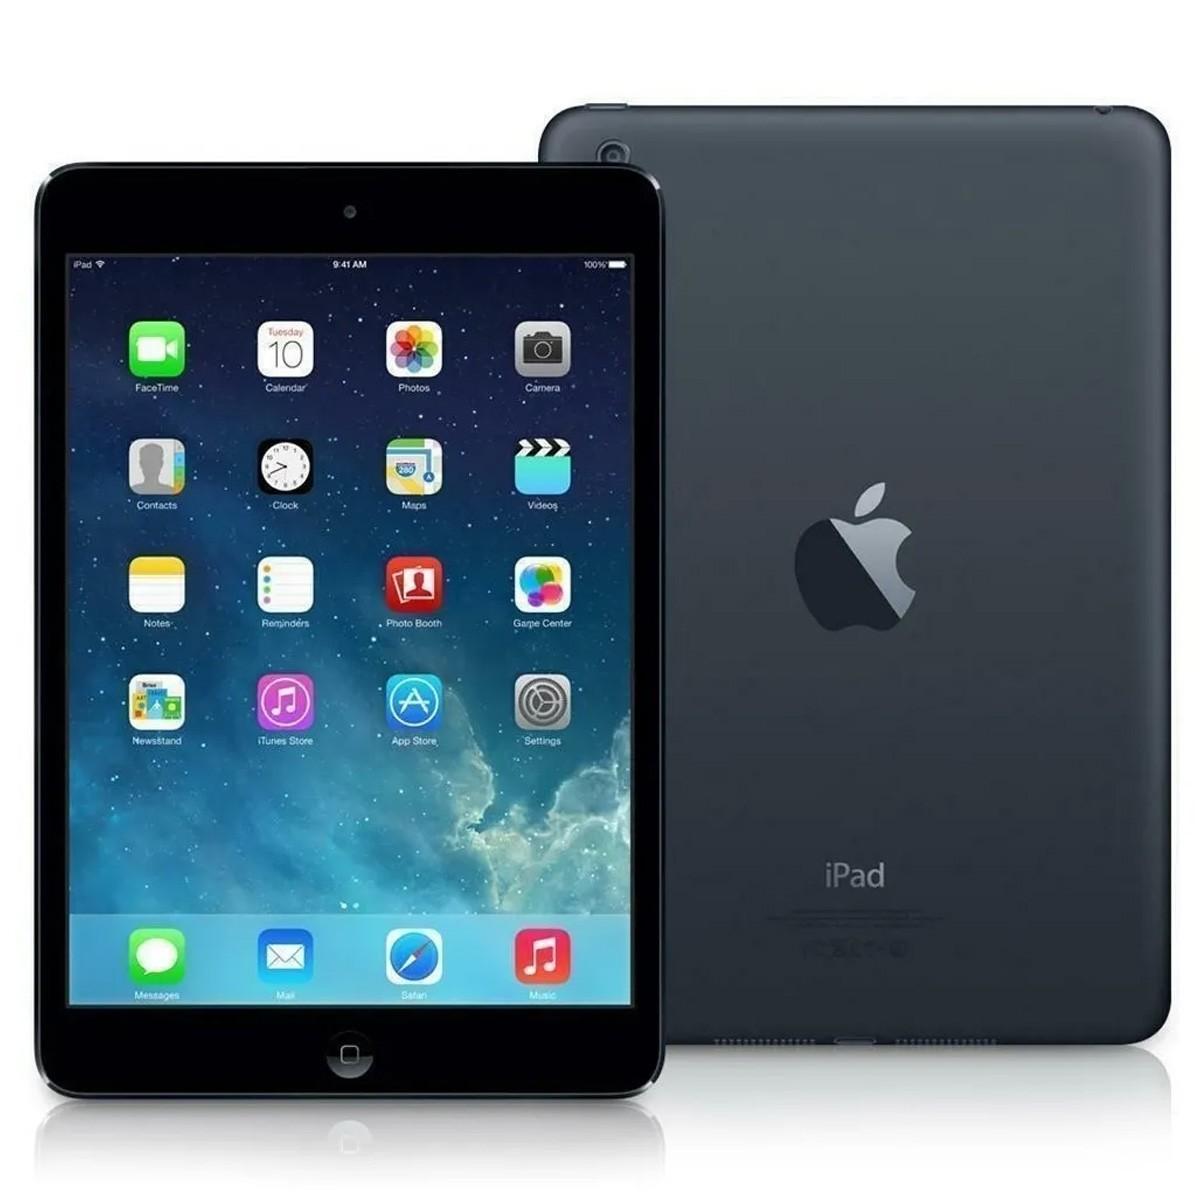 iPad Mini A1432 Wi-fi 32GB 512MB RAM (Usado)